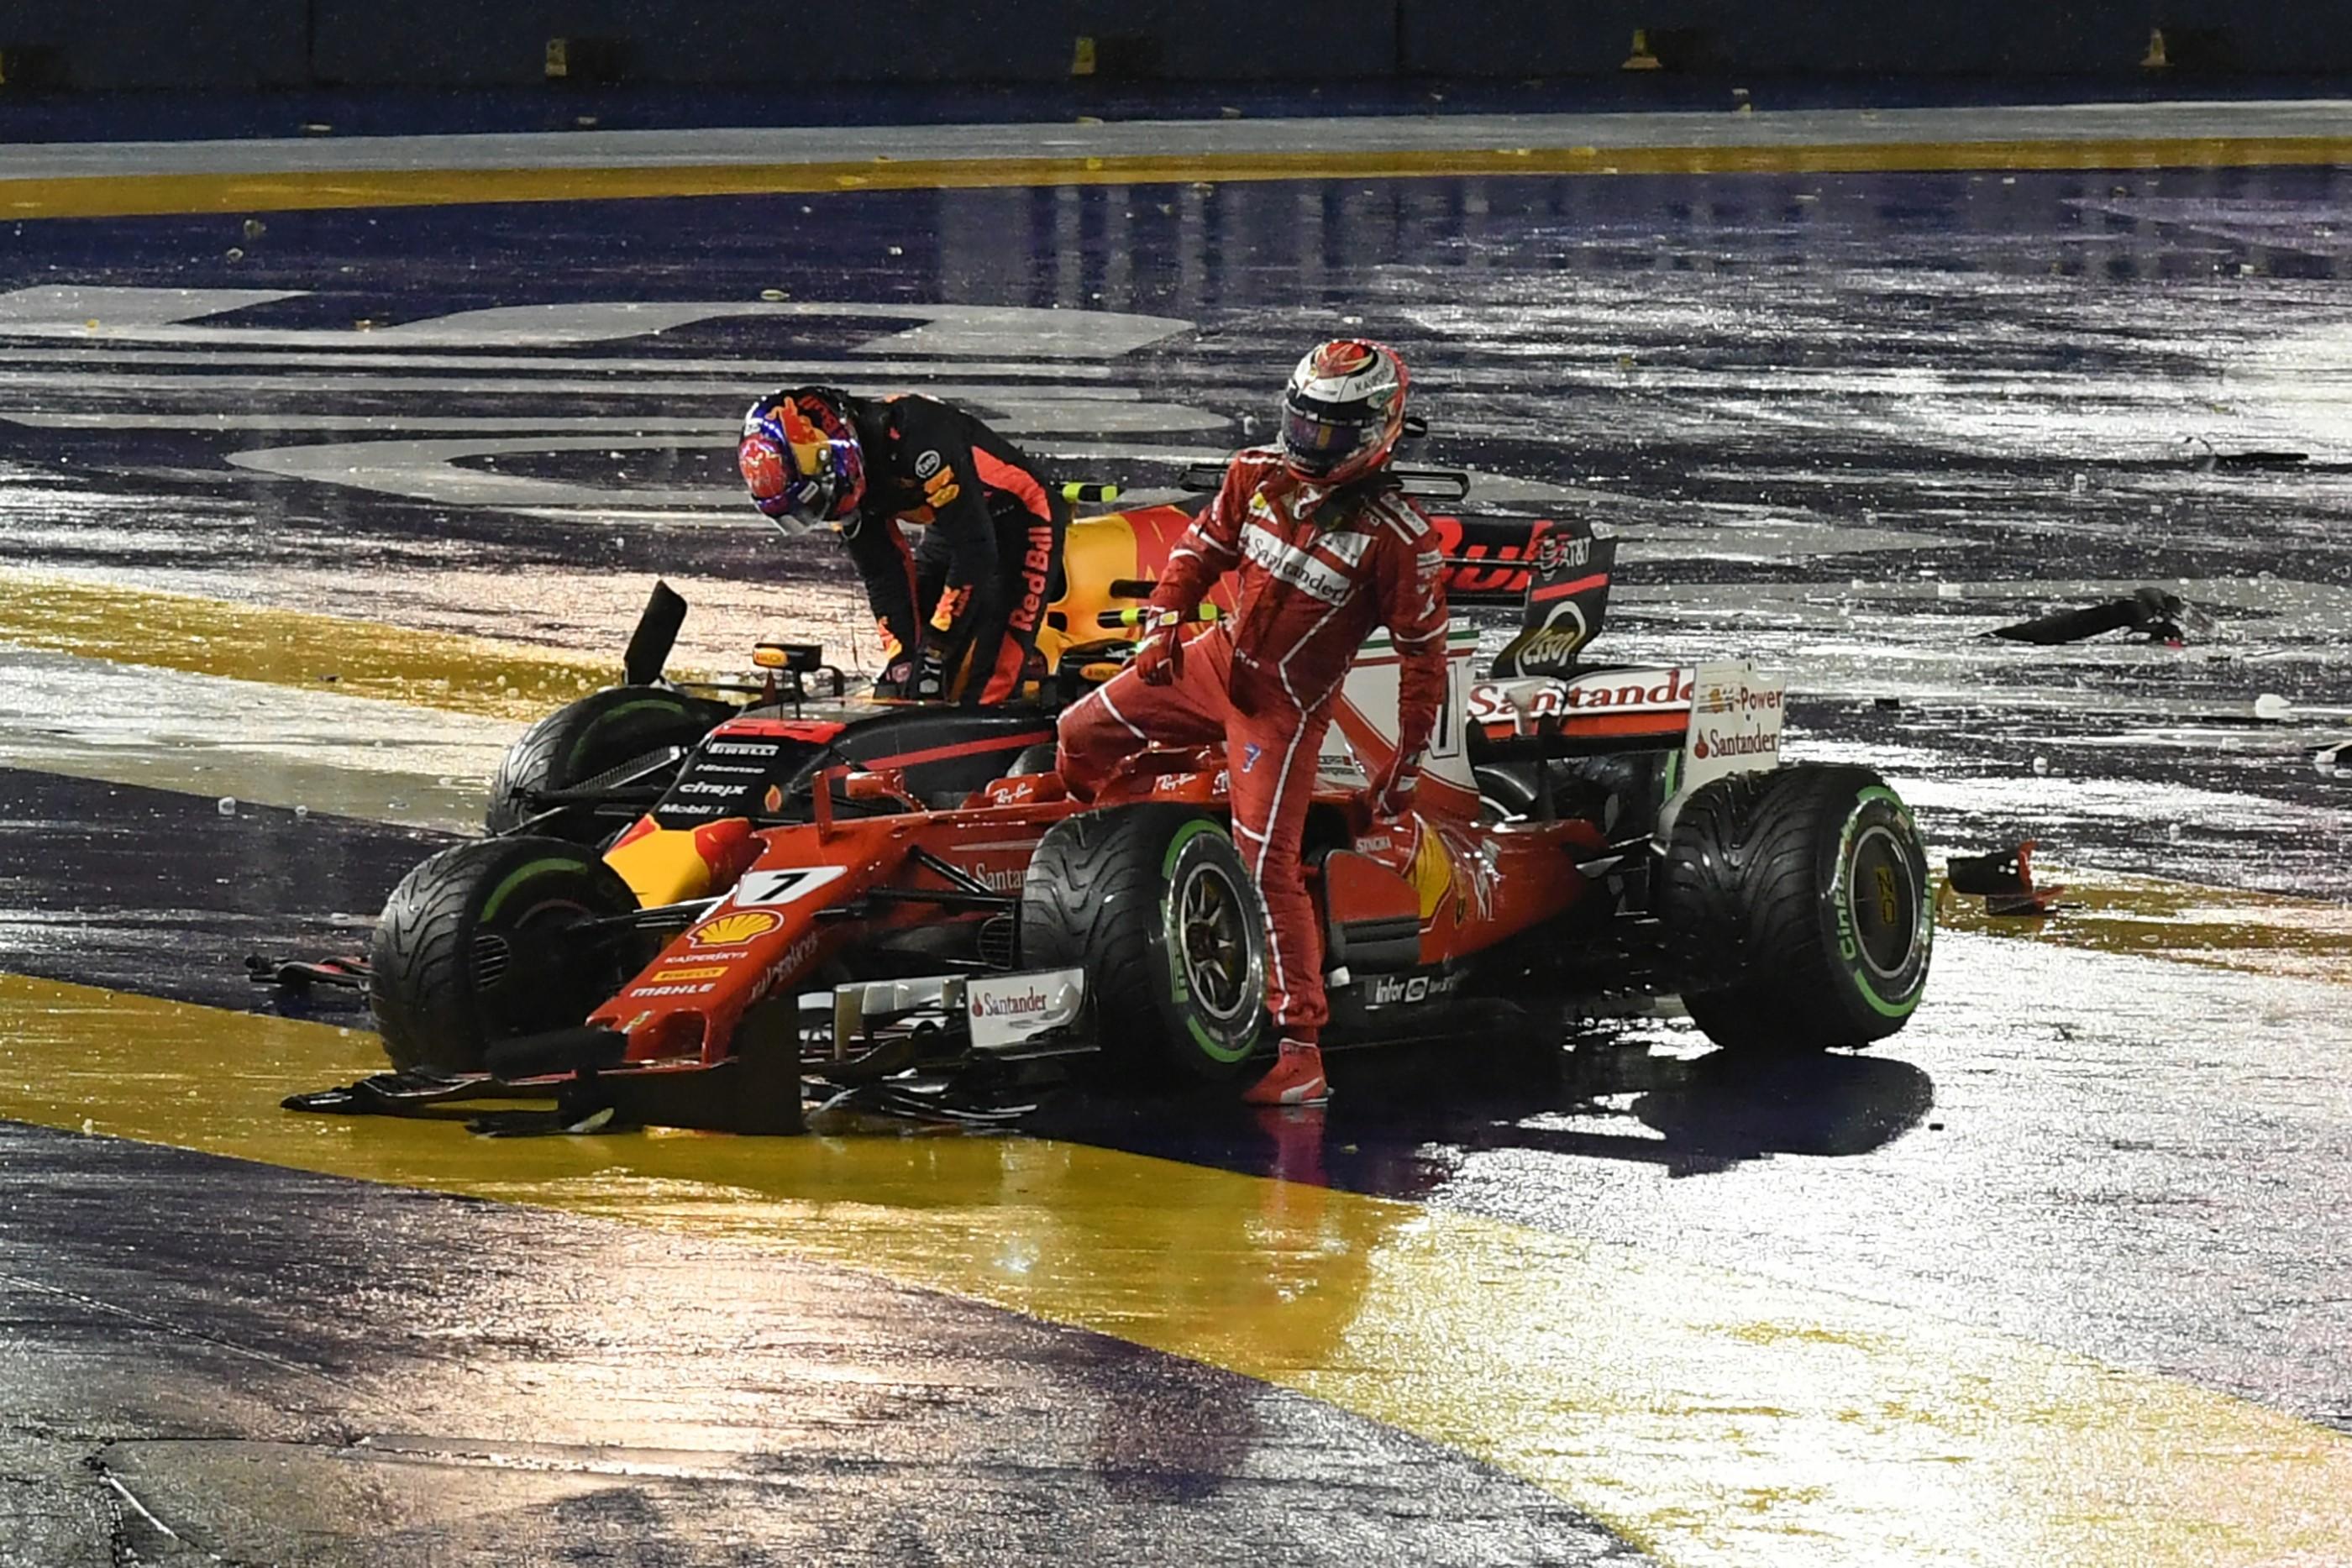 Kimi Räikkönen (Ferrari) et Daniel Ricciardo (Red Bull) au Grand Prix de Singapour 2017